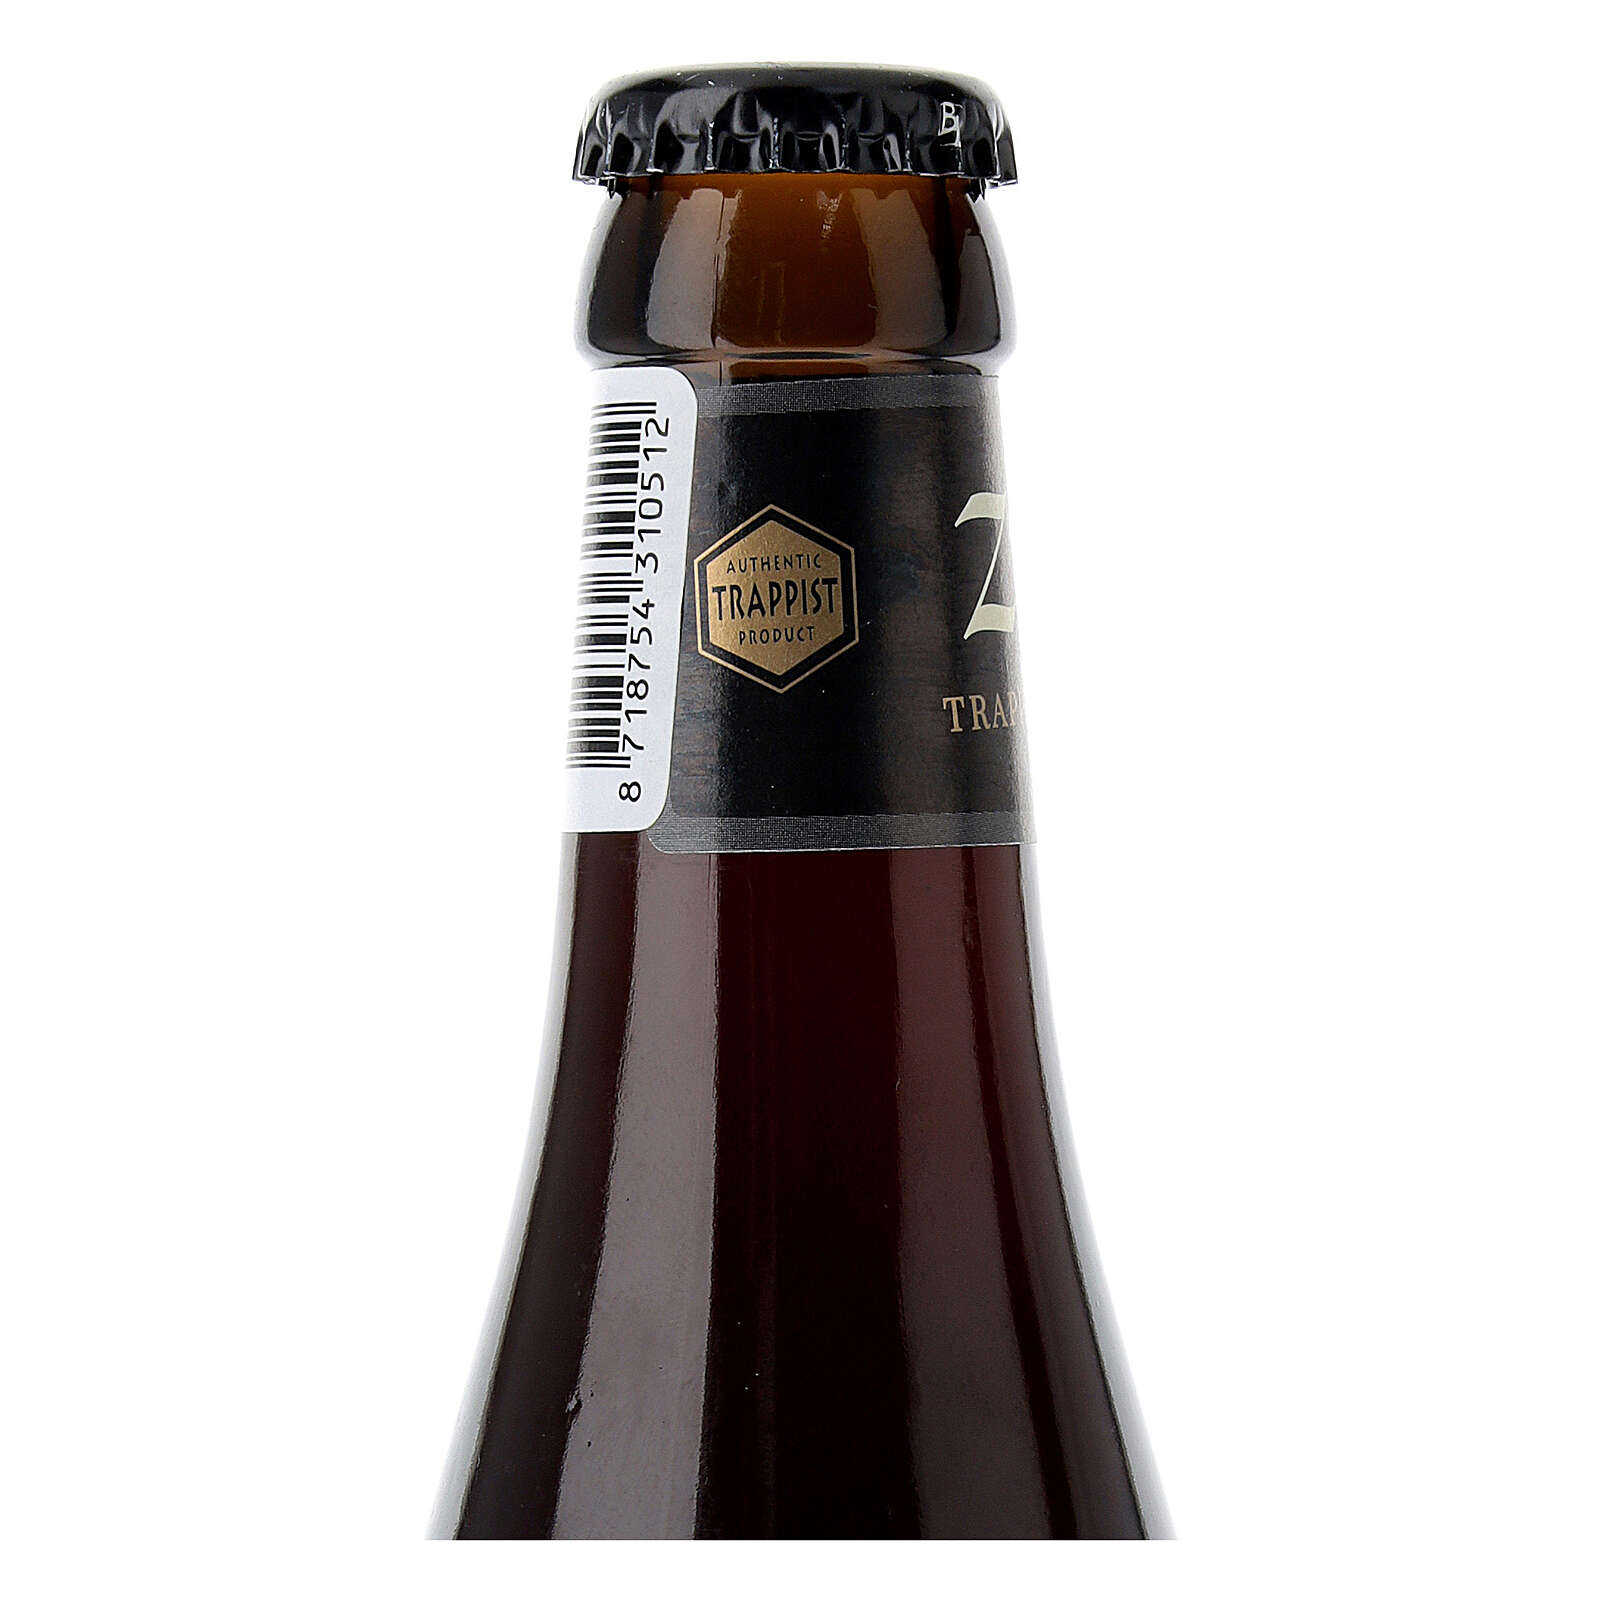 Trappist beer Zundert 10 brown 33 cl 3